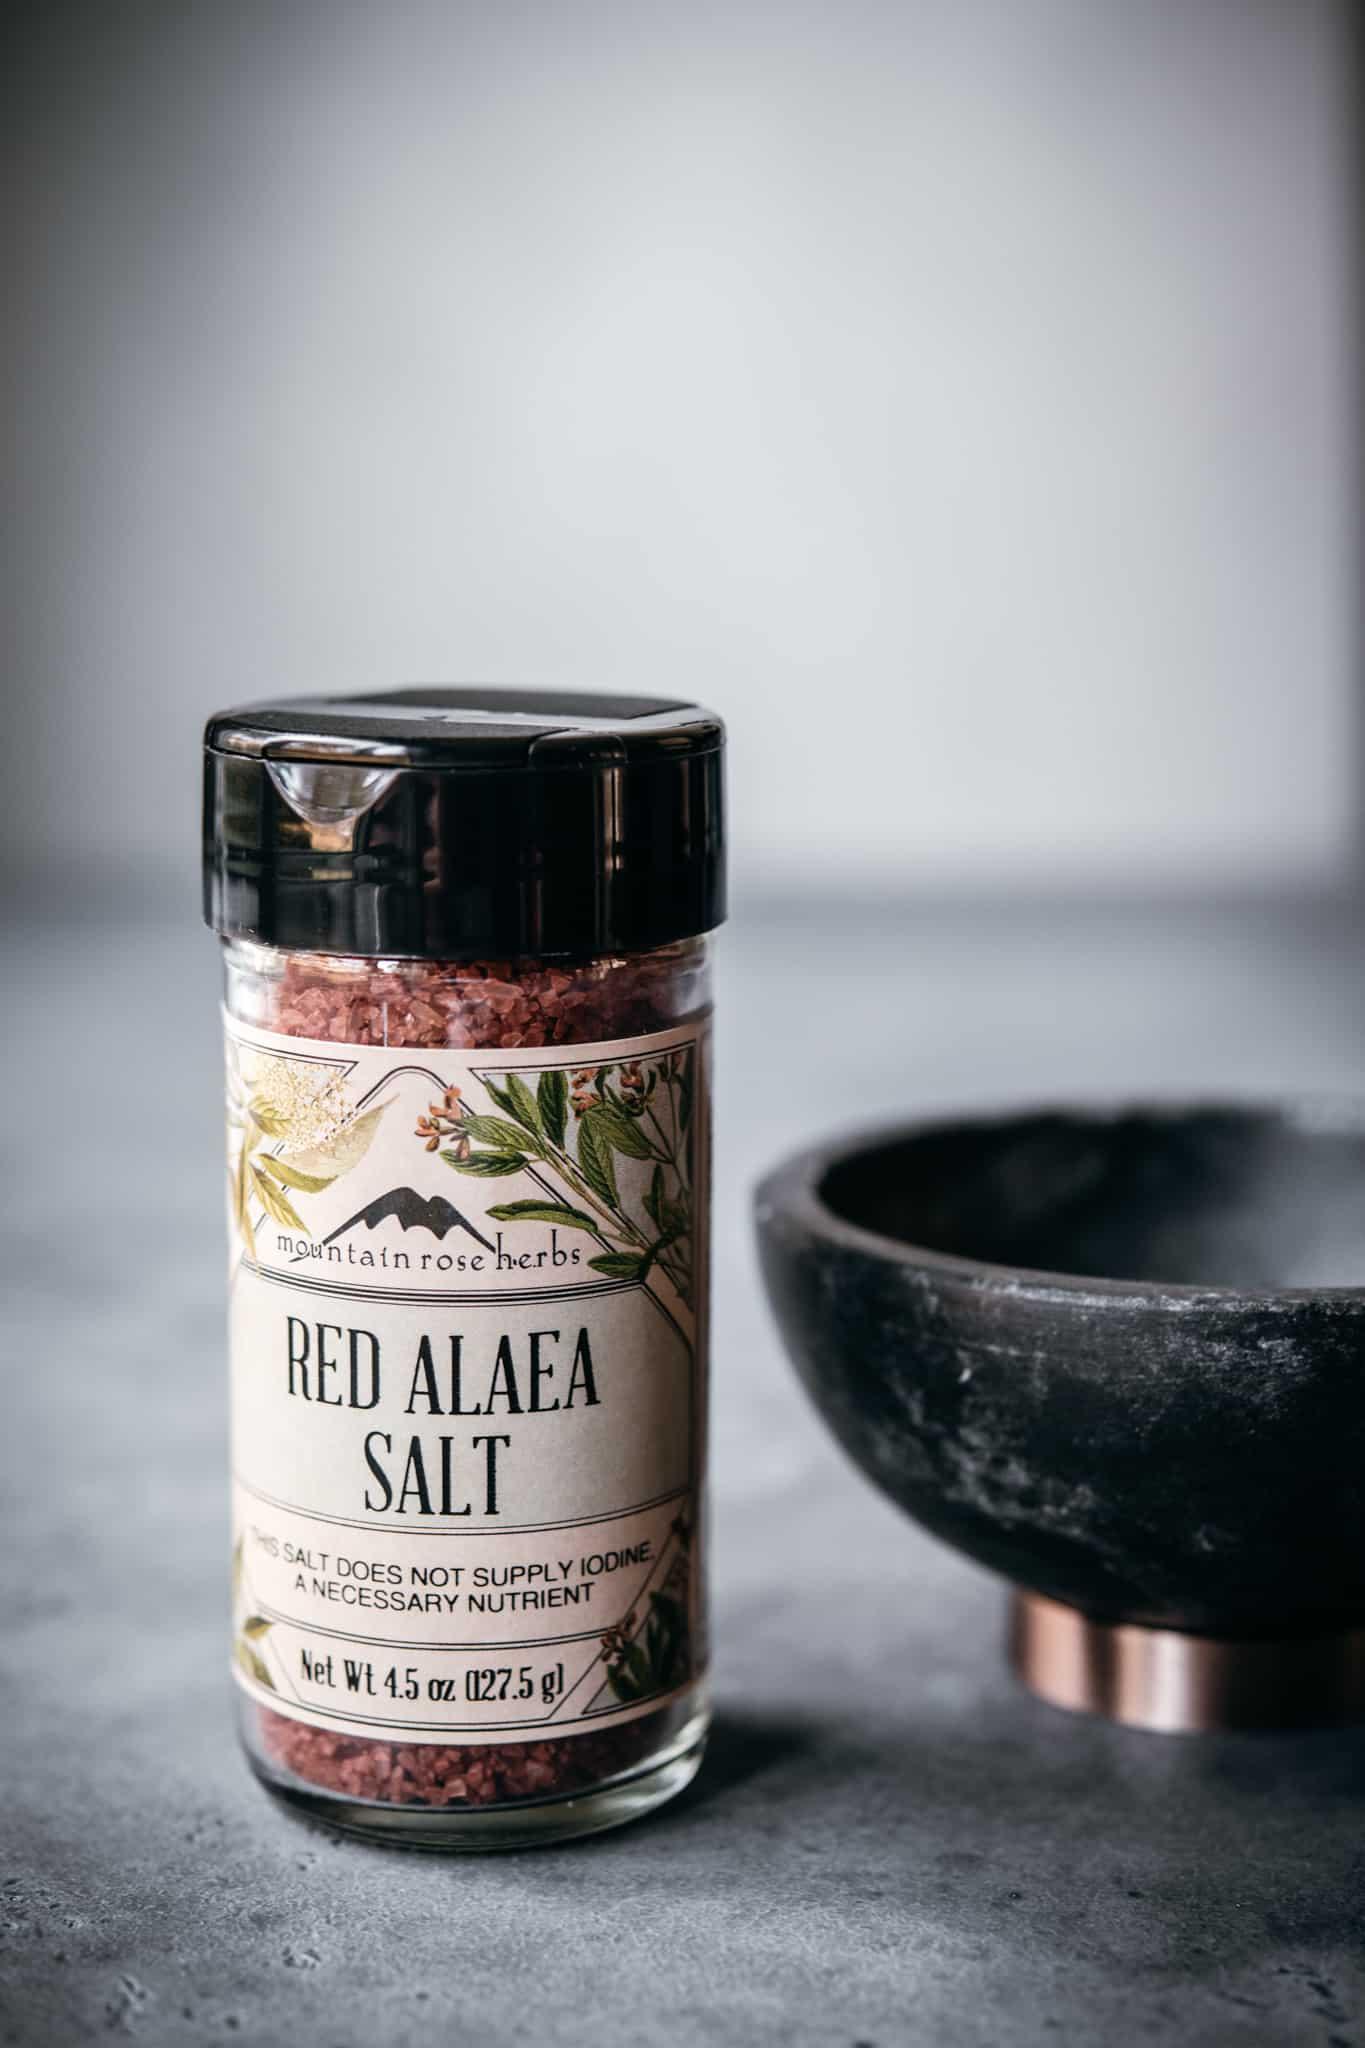 Mountain Rose Herbs red alaea salt in bottle